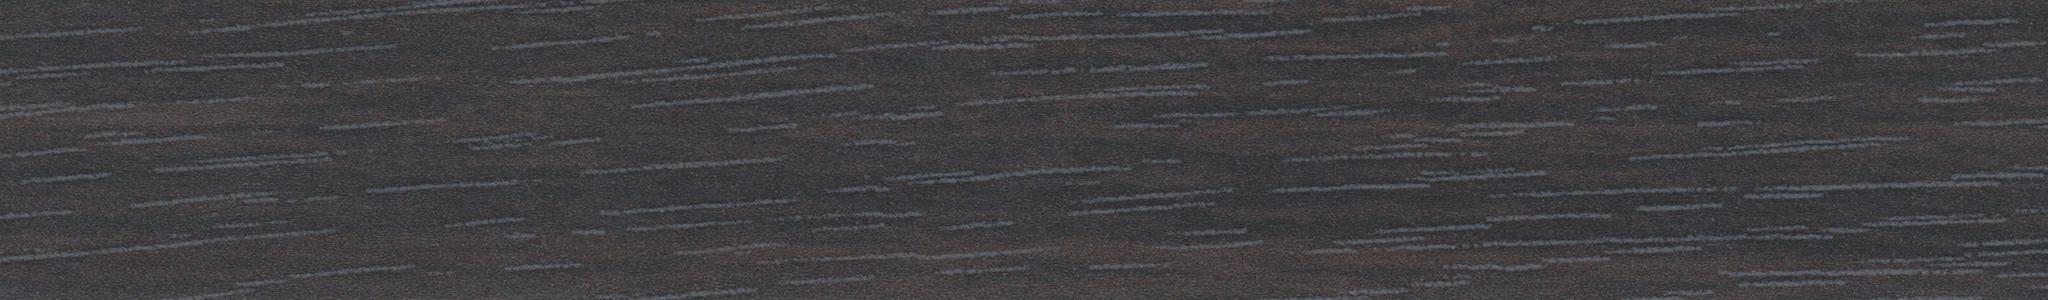 HD 44623 Melamin Kante Schwarz Eiche Pore